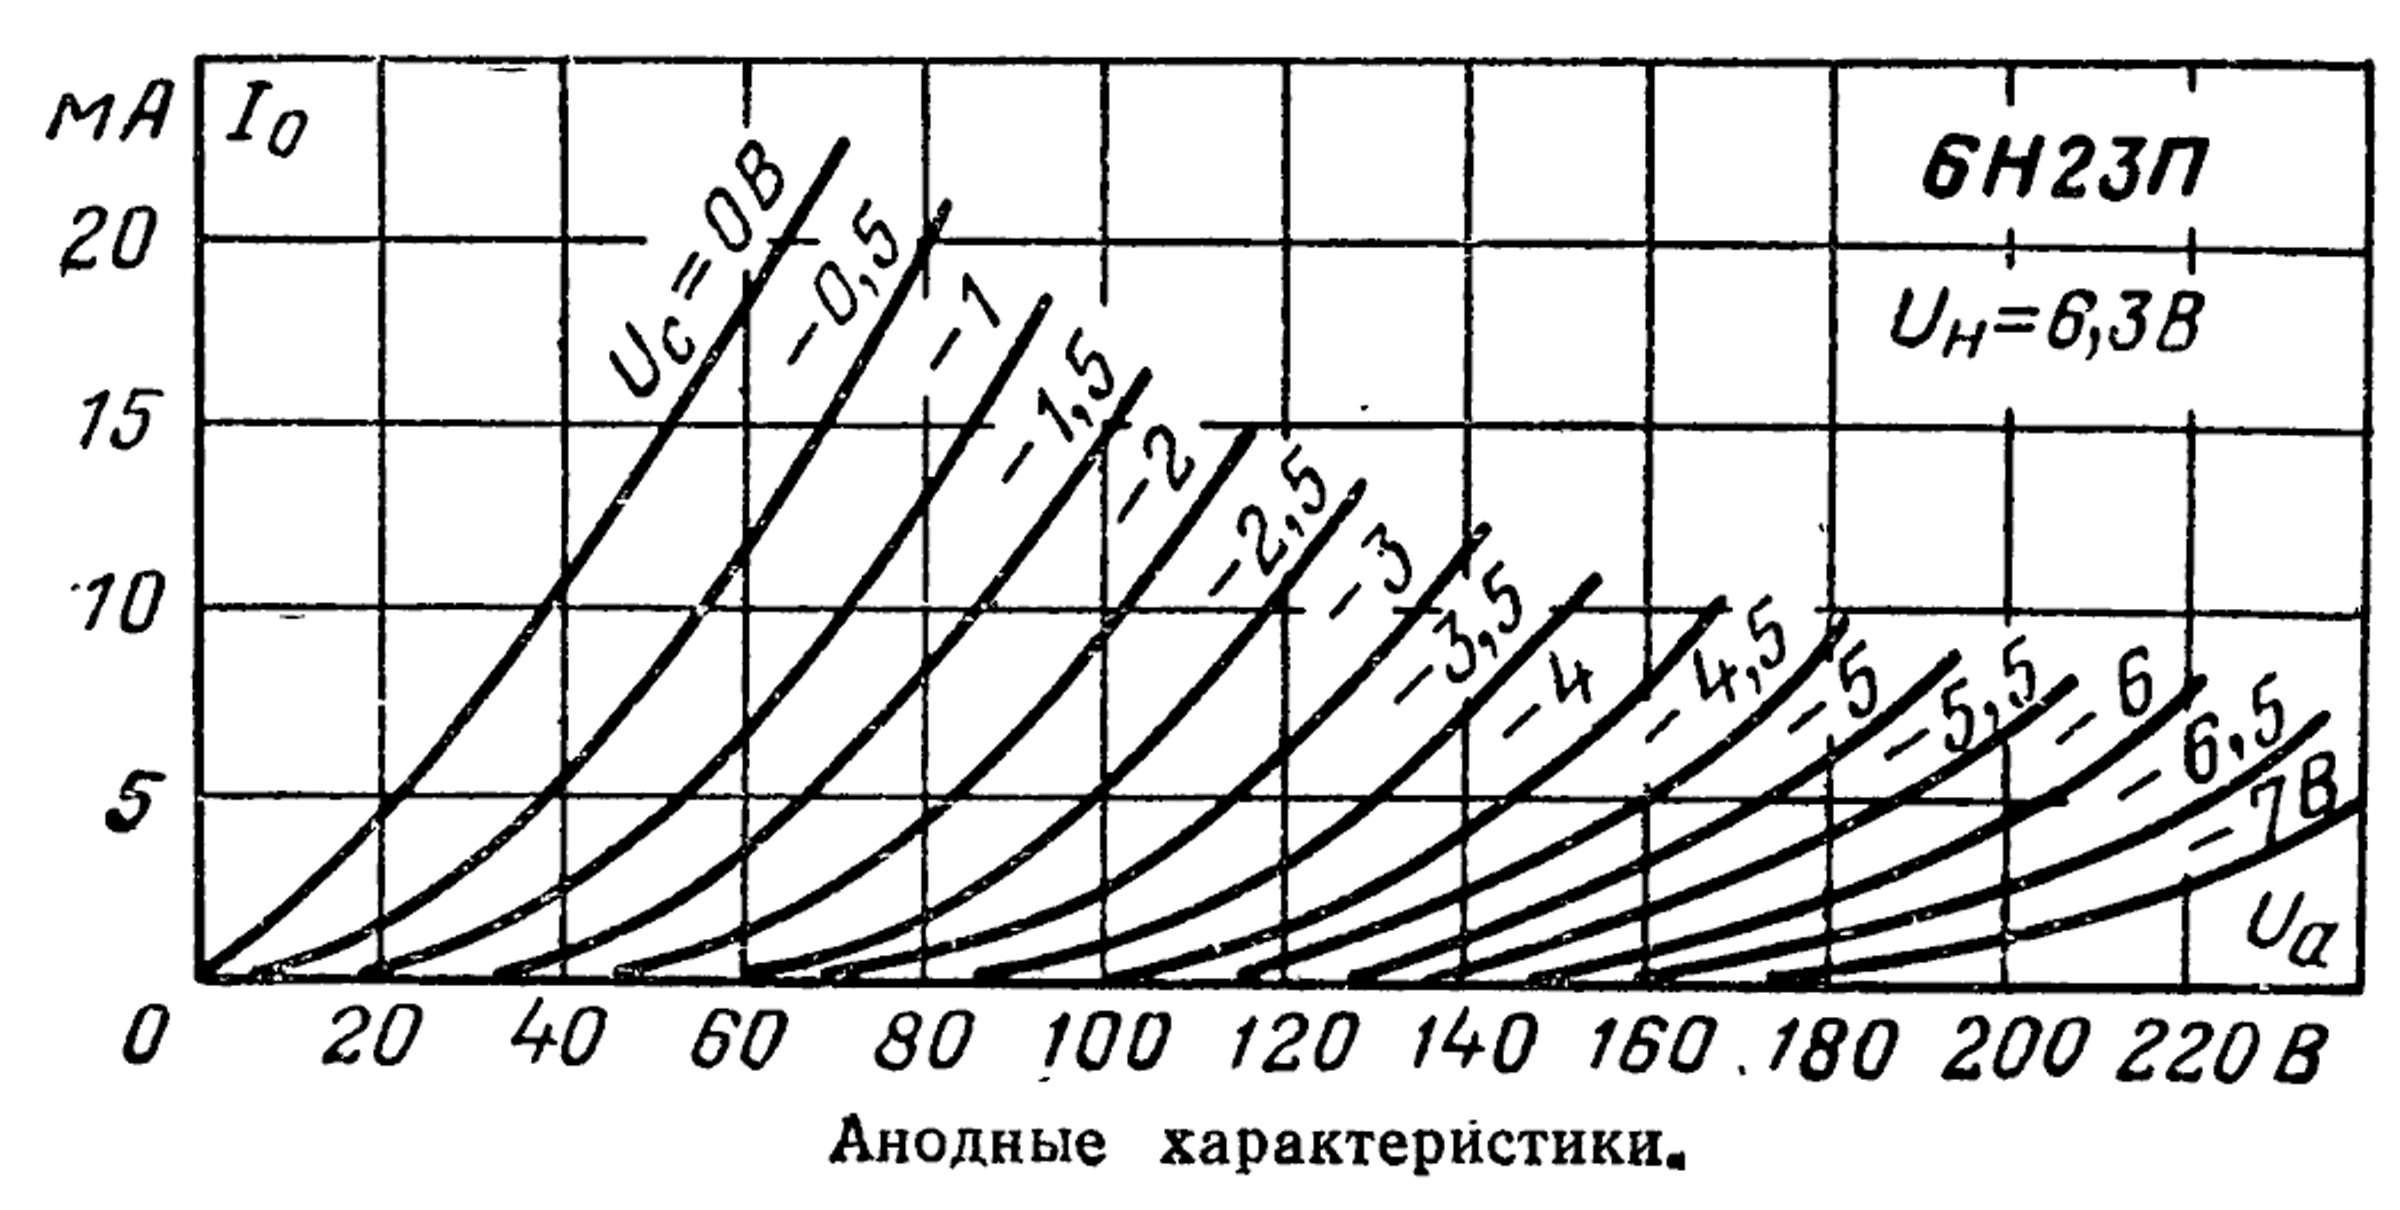 Параметры радиолампы 6Н23П